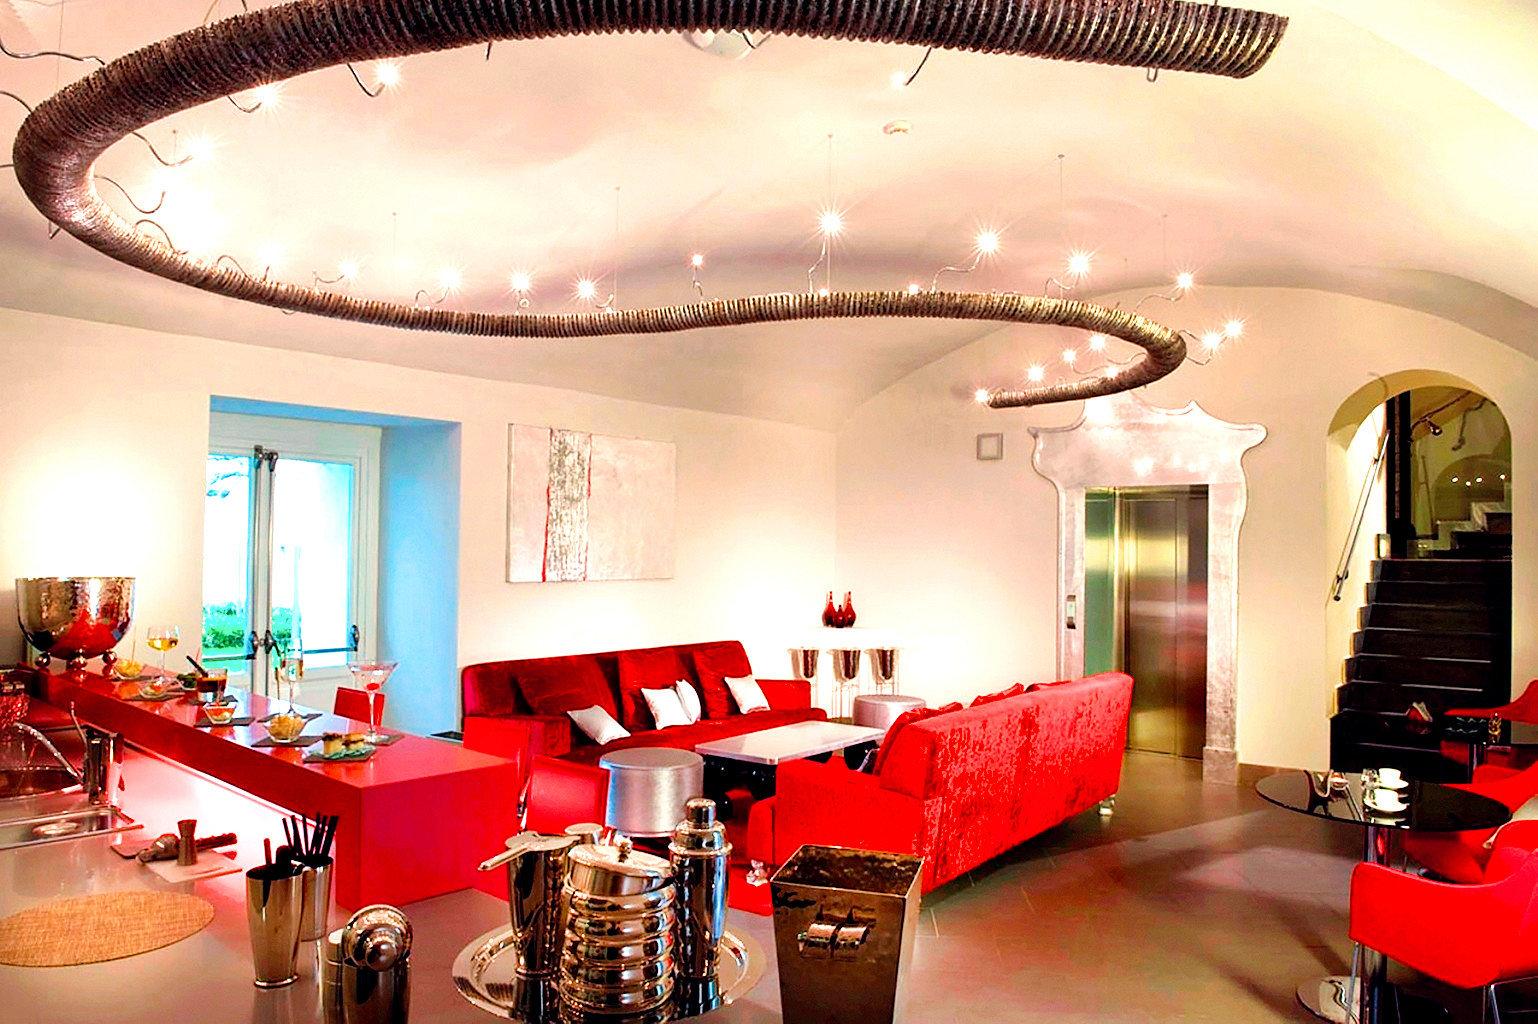 Dining Drink Eat Modern Resort red restaurant Lobby Bar function hall living room leather